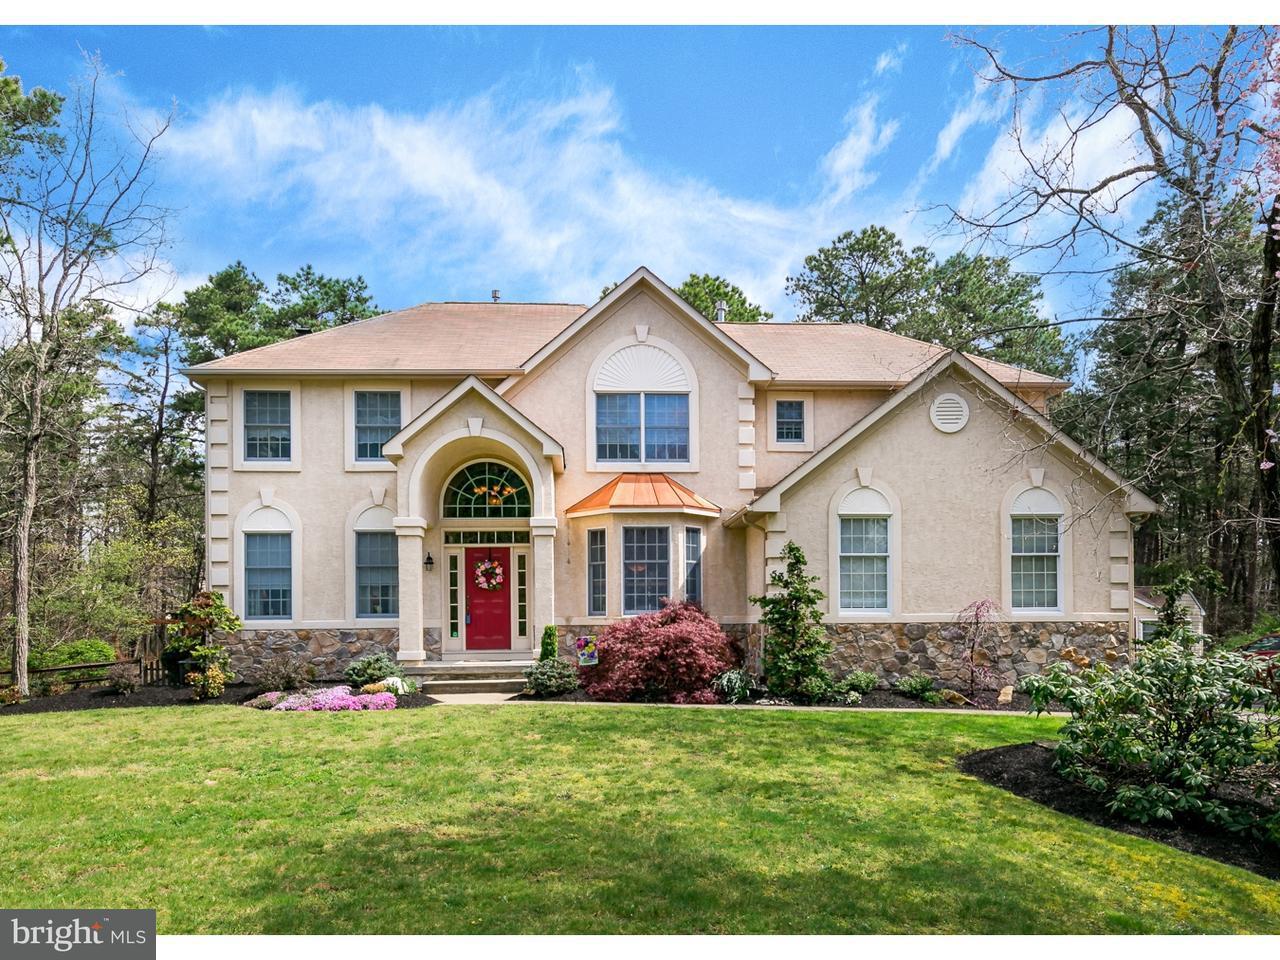 独户住宅 为 销售 在 53 JOHN SINGER SARGENT WAY Evesham Twp, 新泽西州 08053 美国